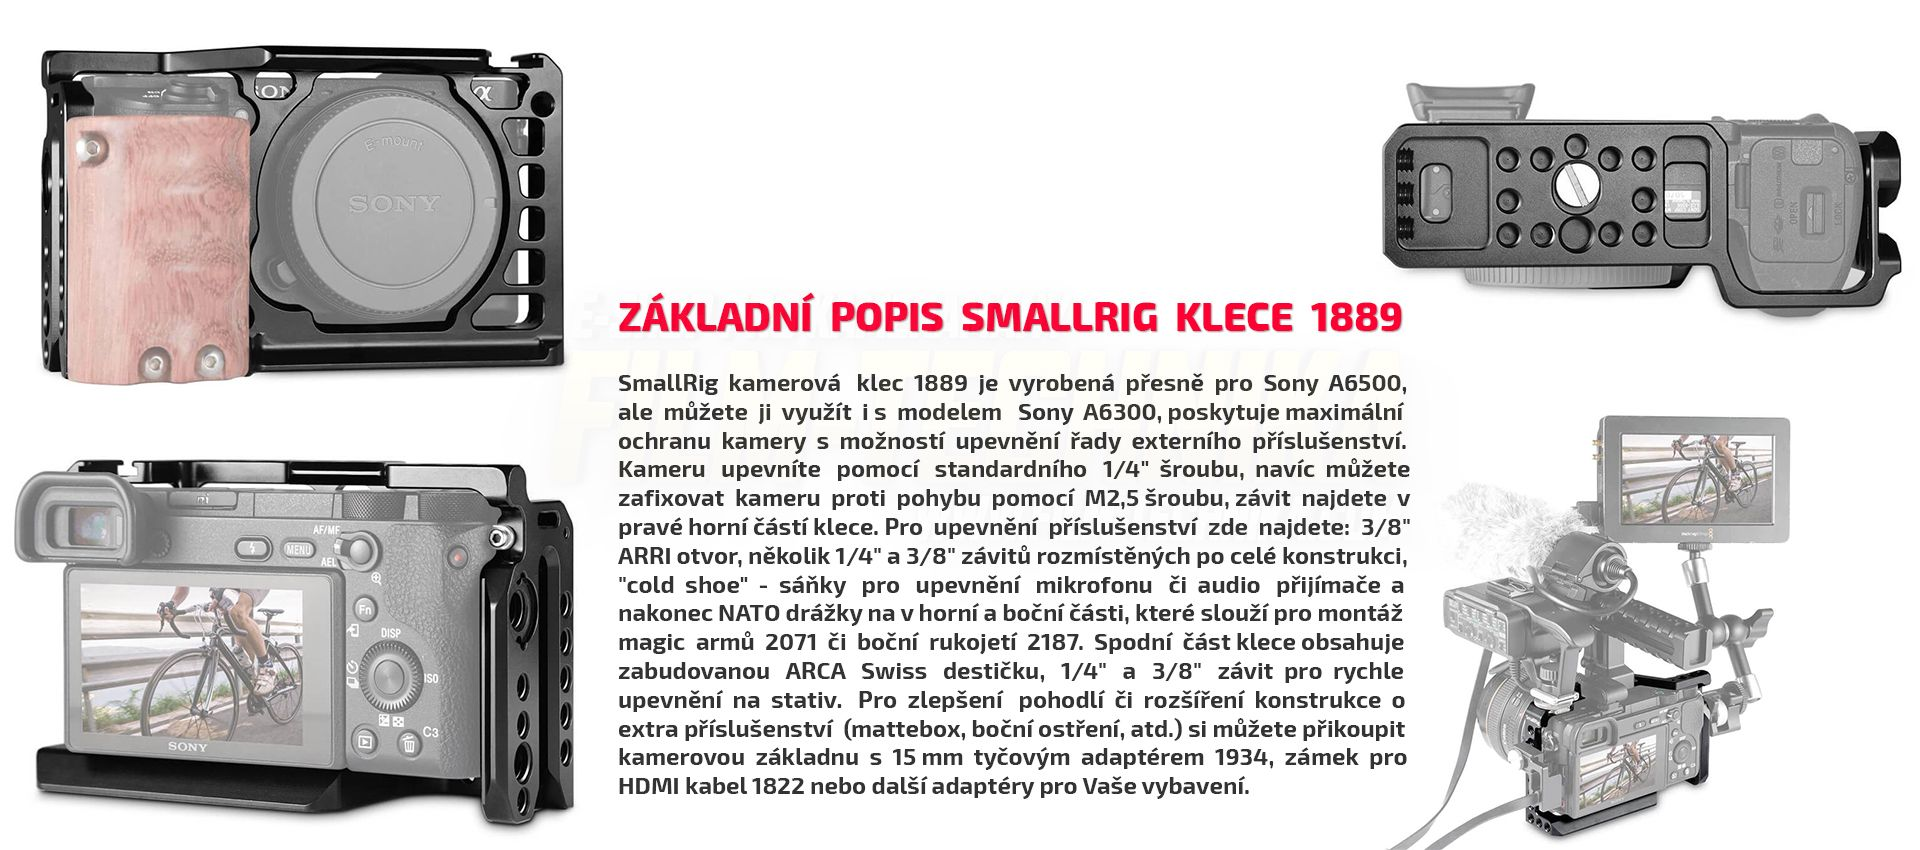 film-technika-smallrog-a5000-klec-3intext2